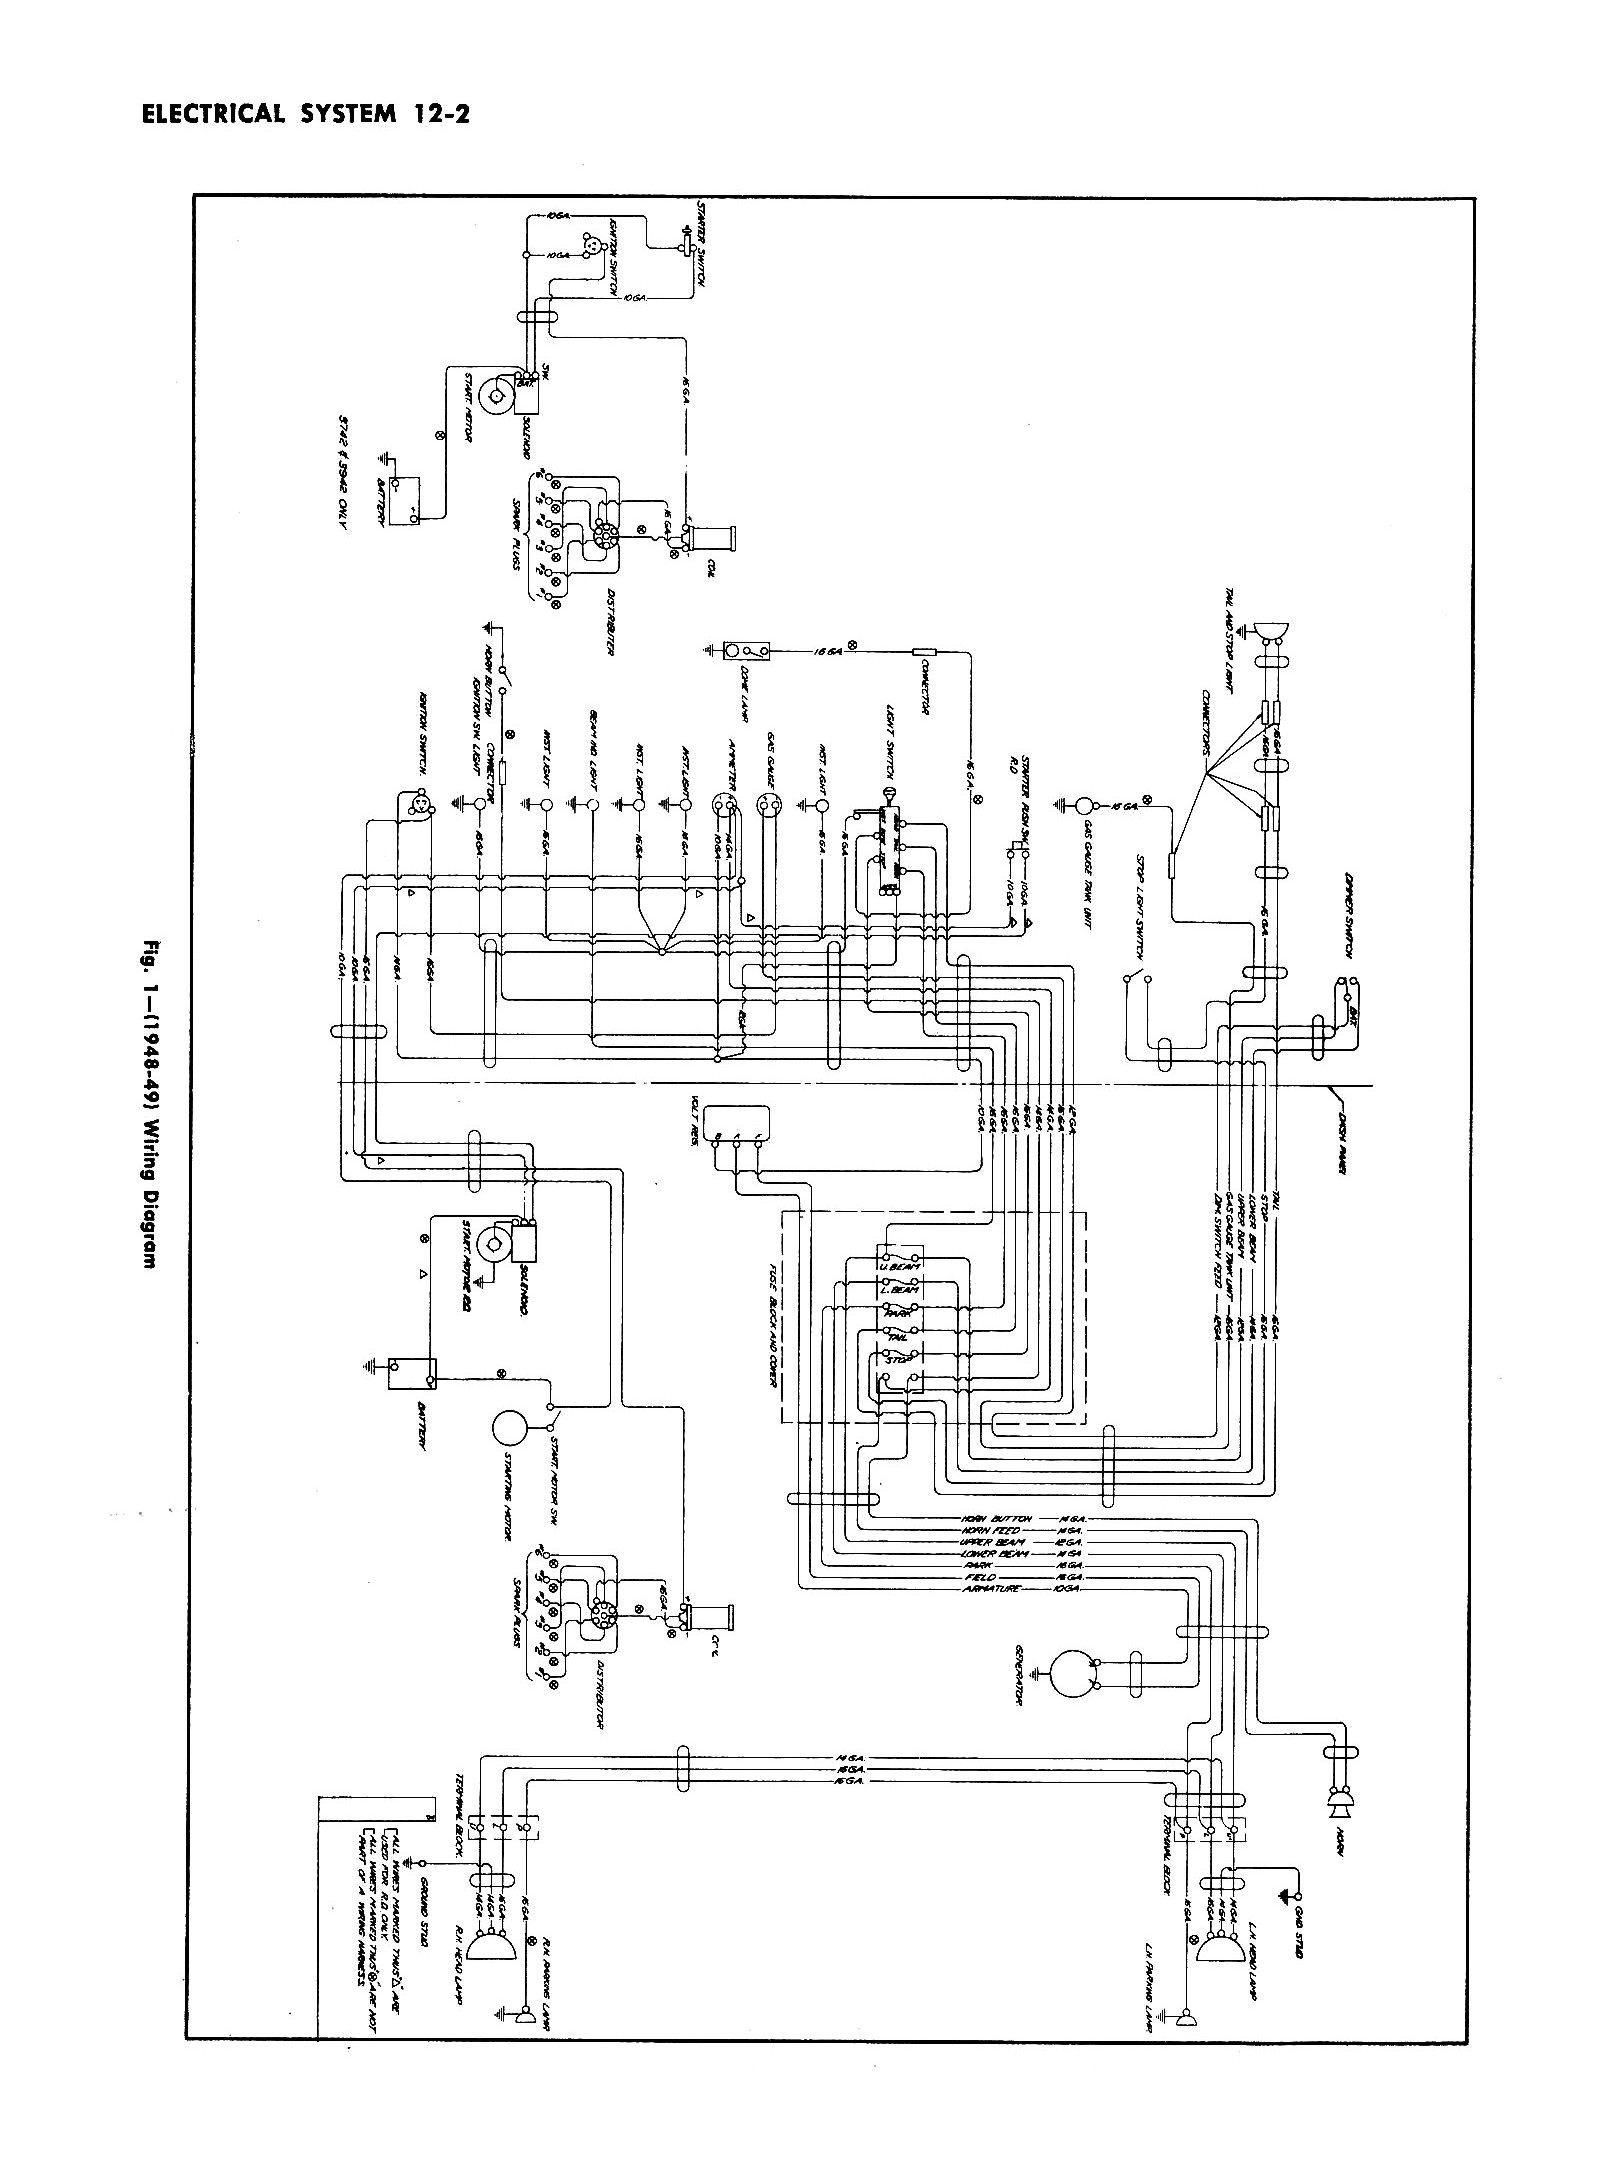 1984 Gmc Sierra Wiring Diagram Free For You 06 Tvr 280i Tasmin 35 2006